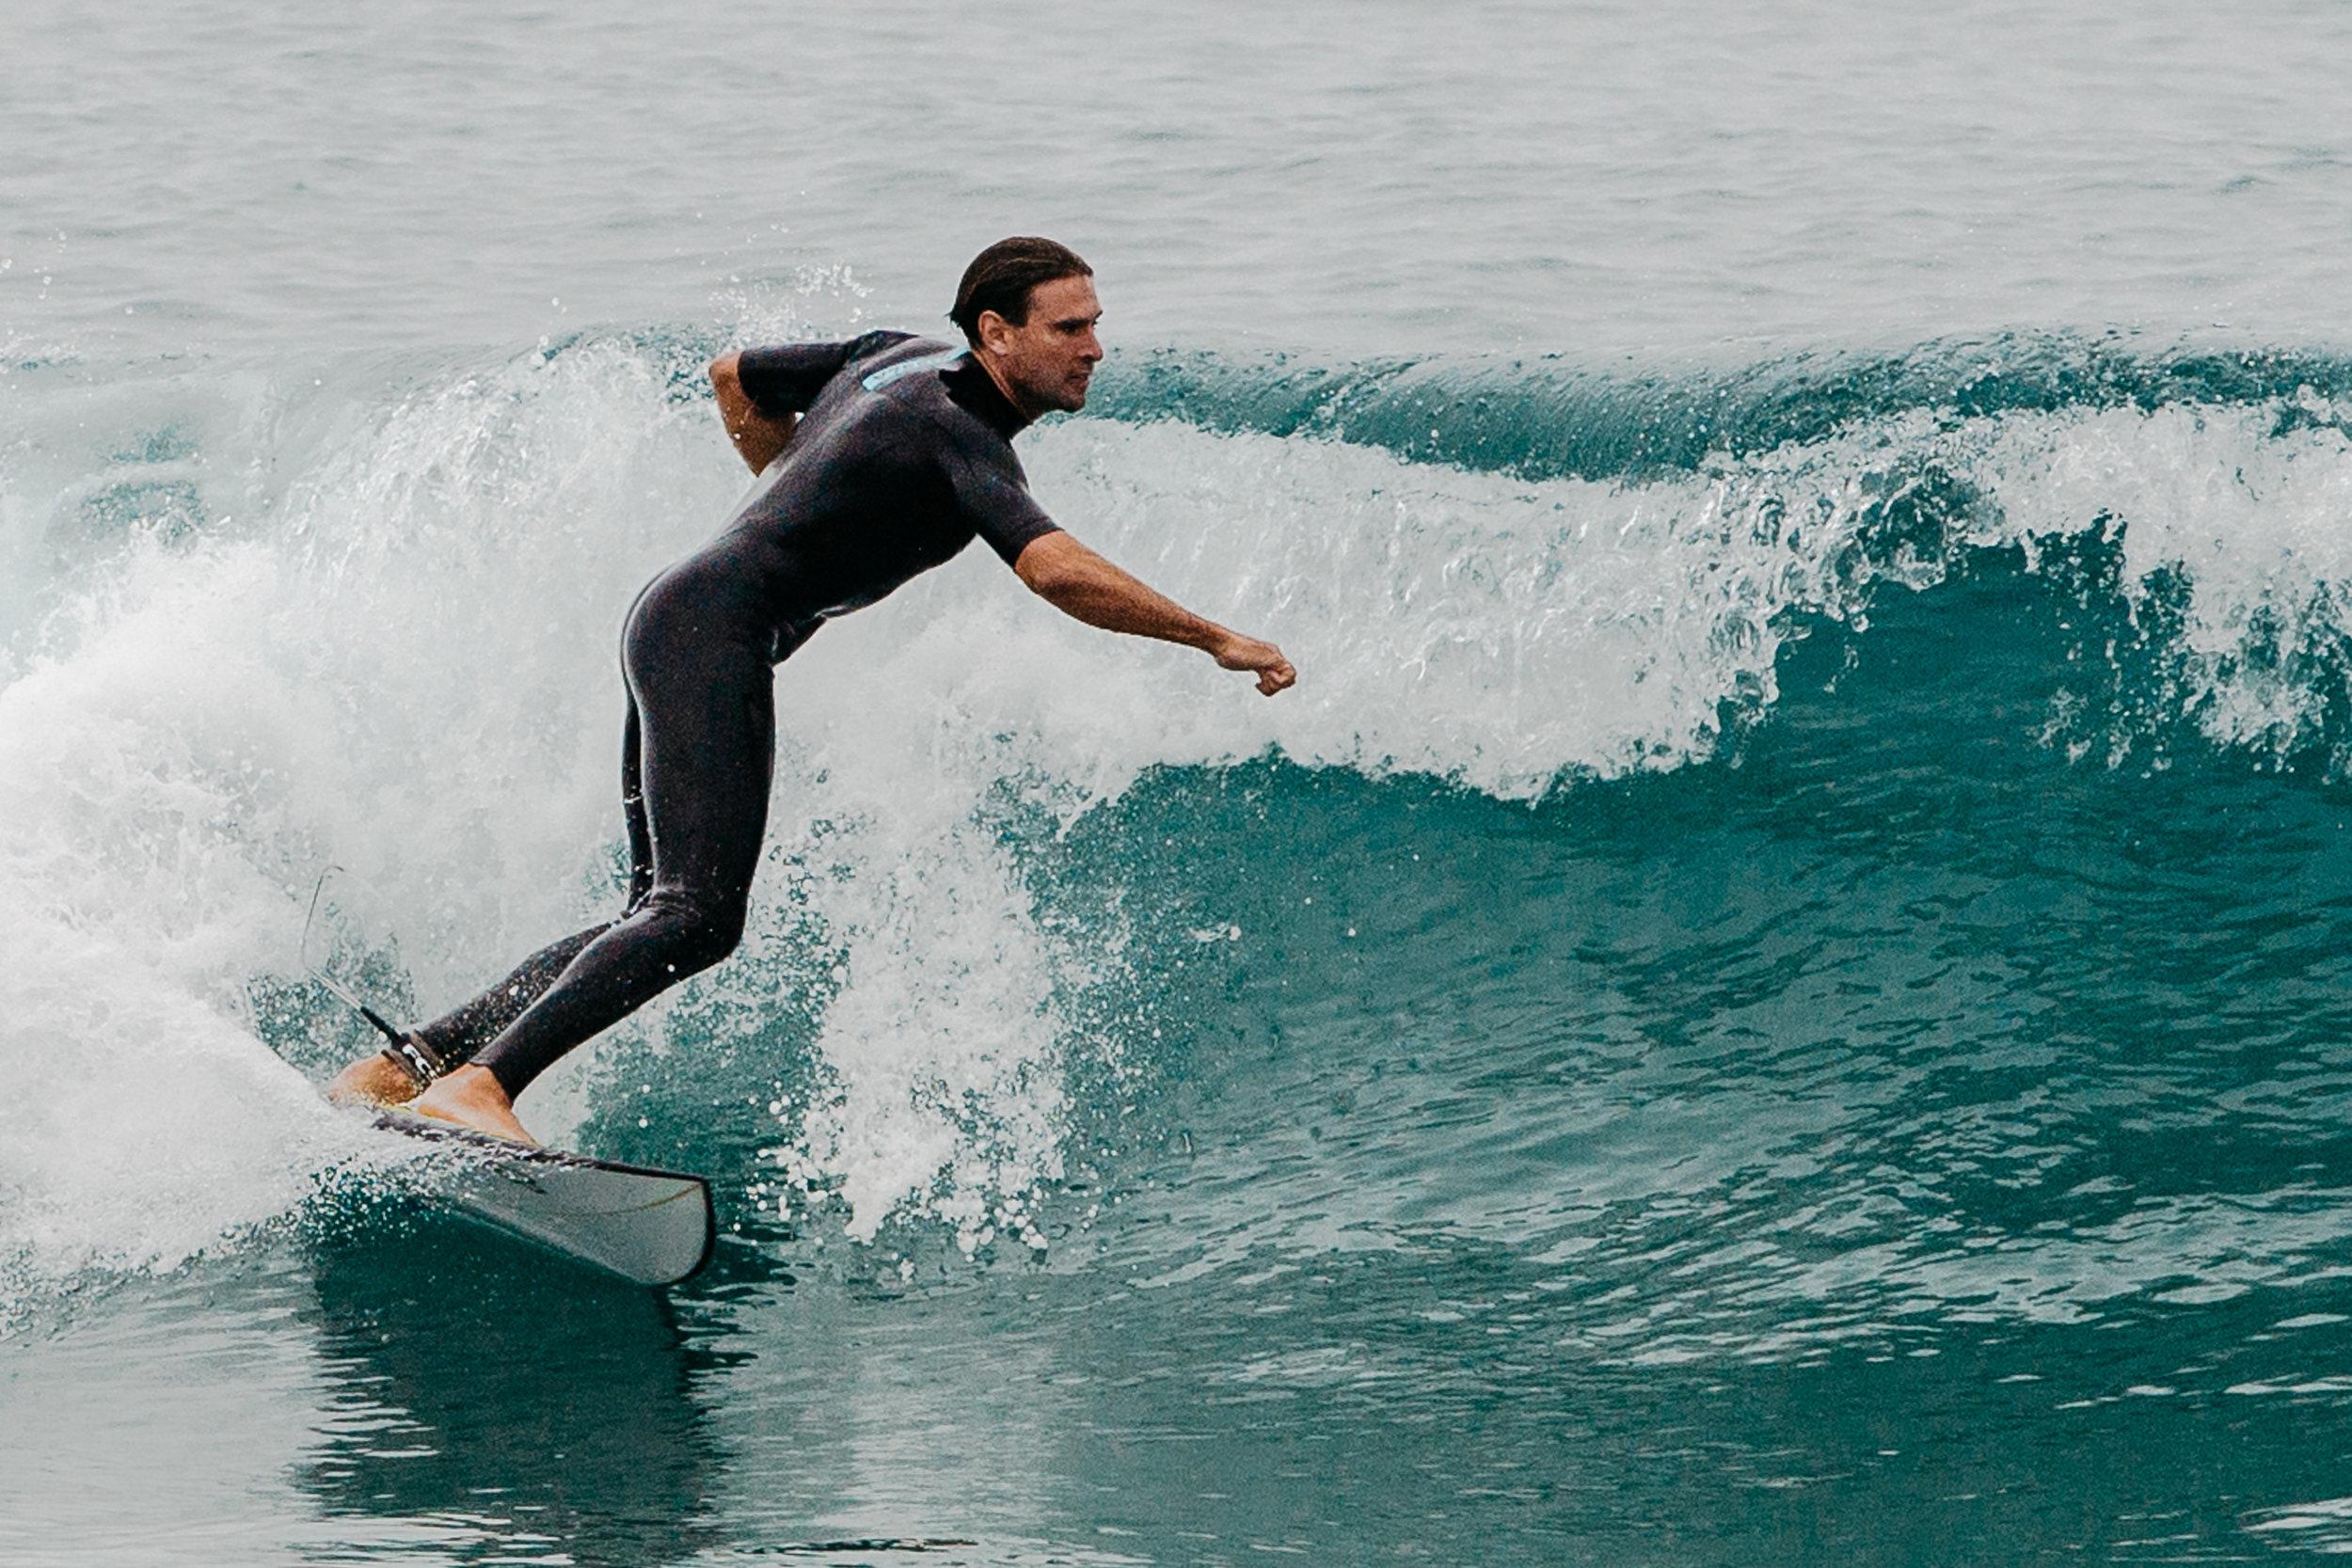 surf_july31-11.JPG